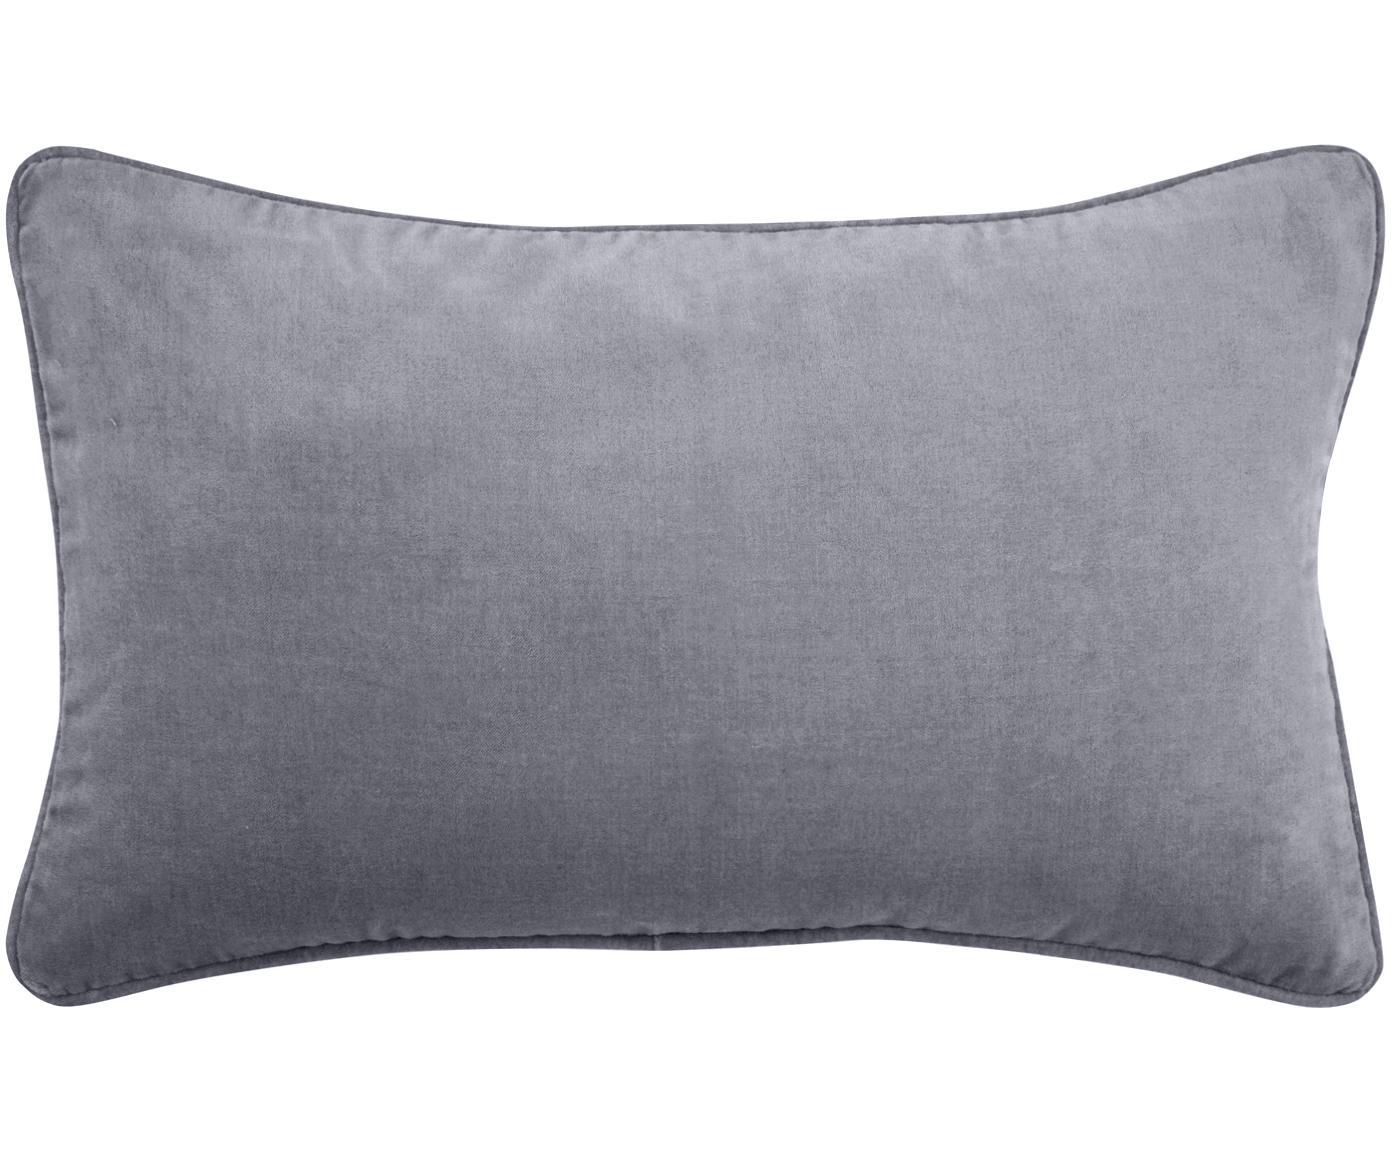 Effen fluwelen kussenhoes Dana in donkergrijs, Katoenfluweel, Donkergrijs, 30 x 50 cm